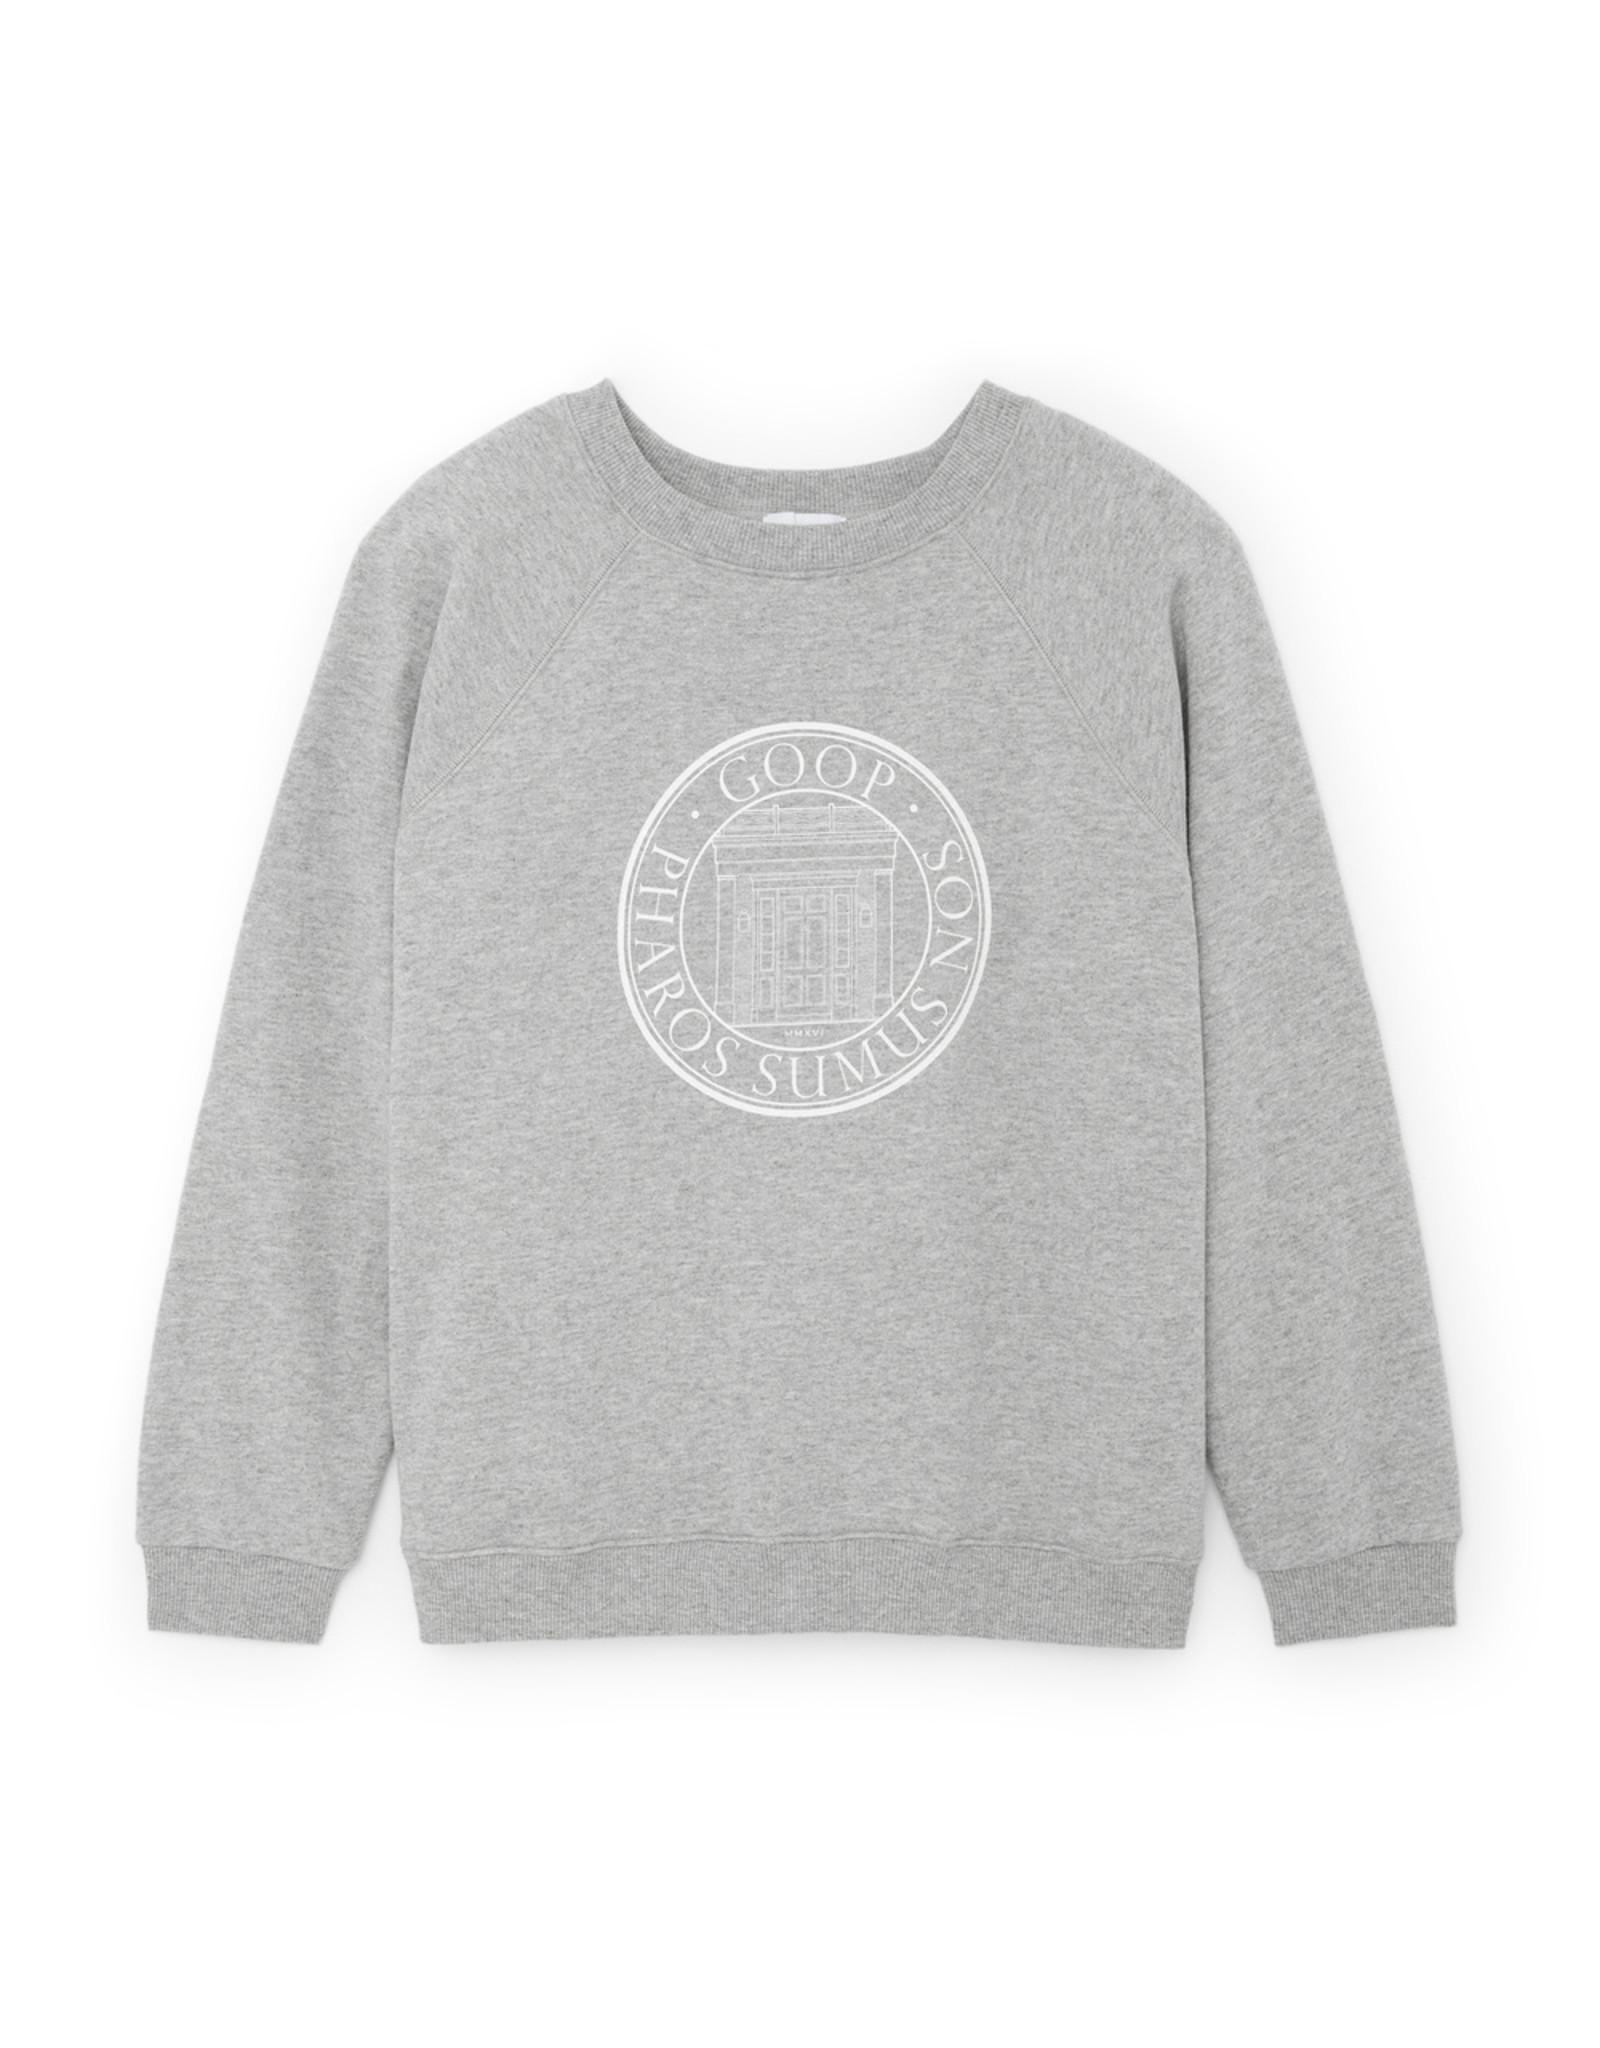 G. Label G. Label goop University Sweatshirt (Color: Grey Heather, Size: XL)